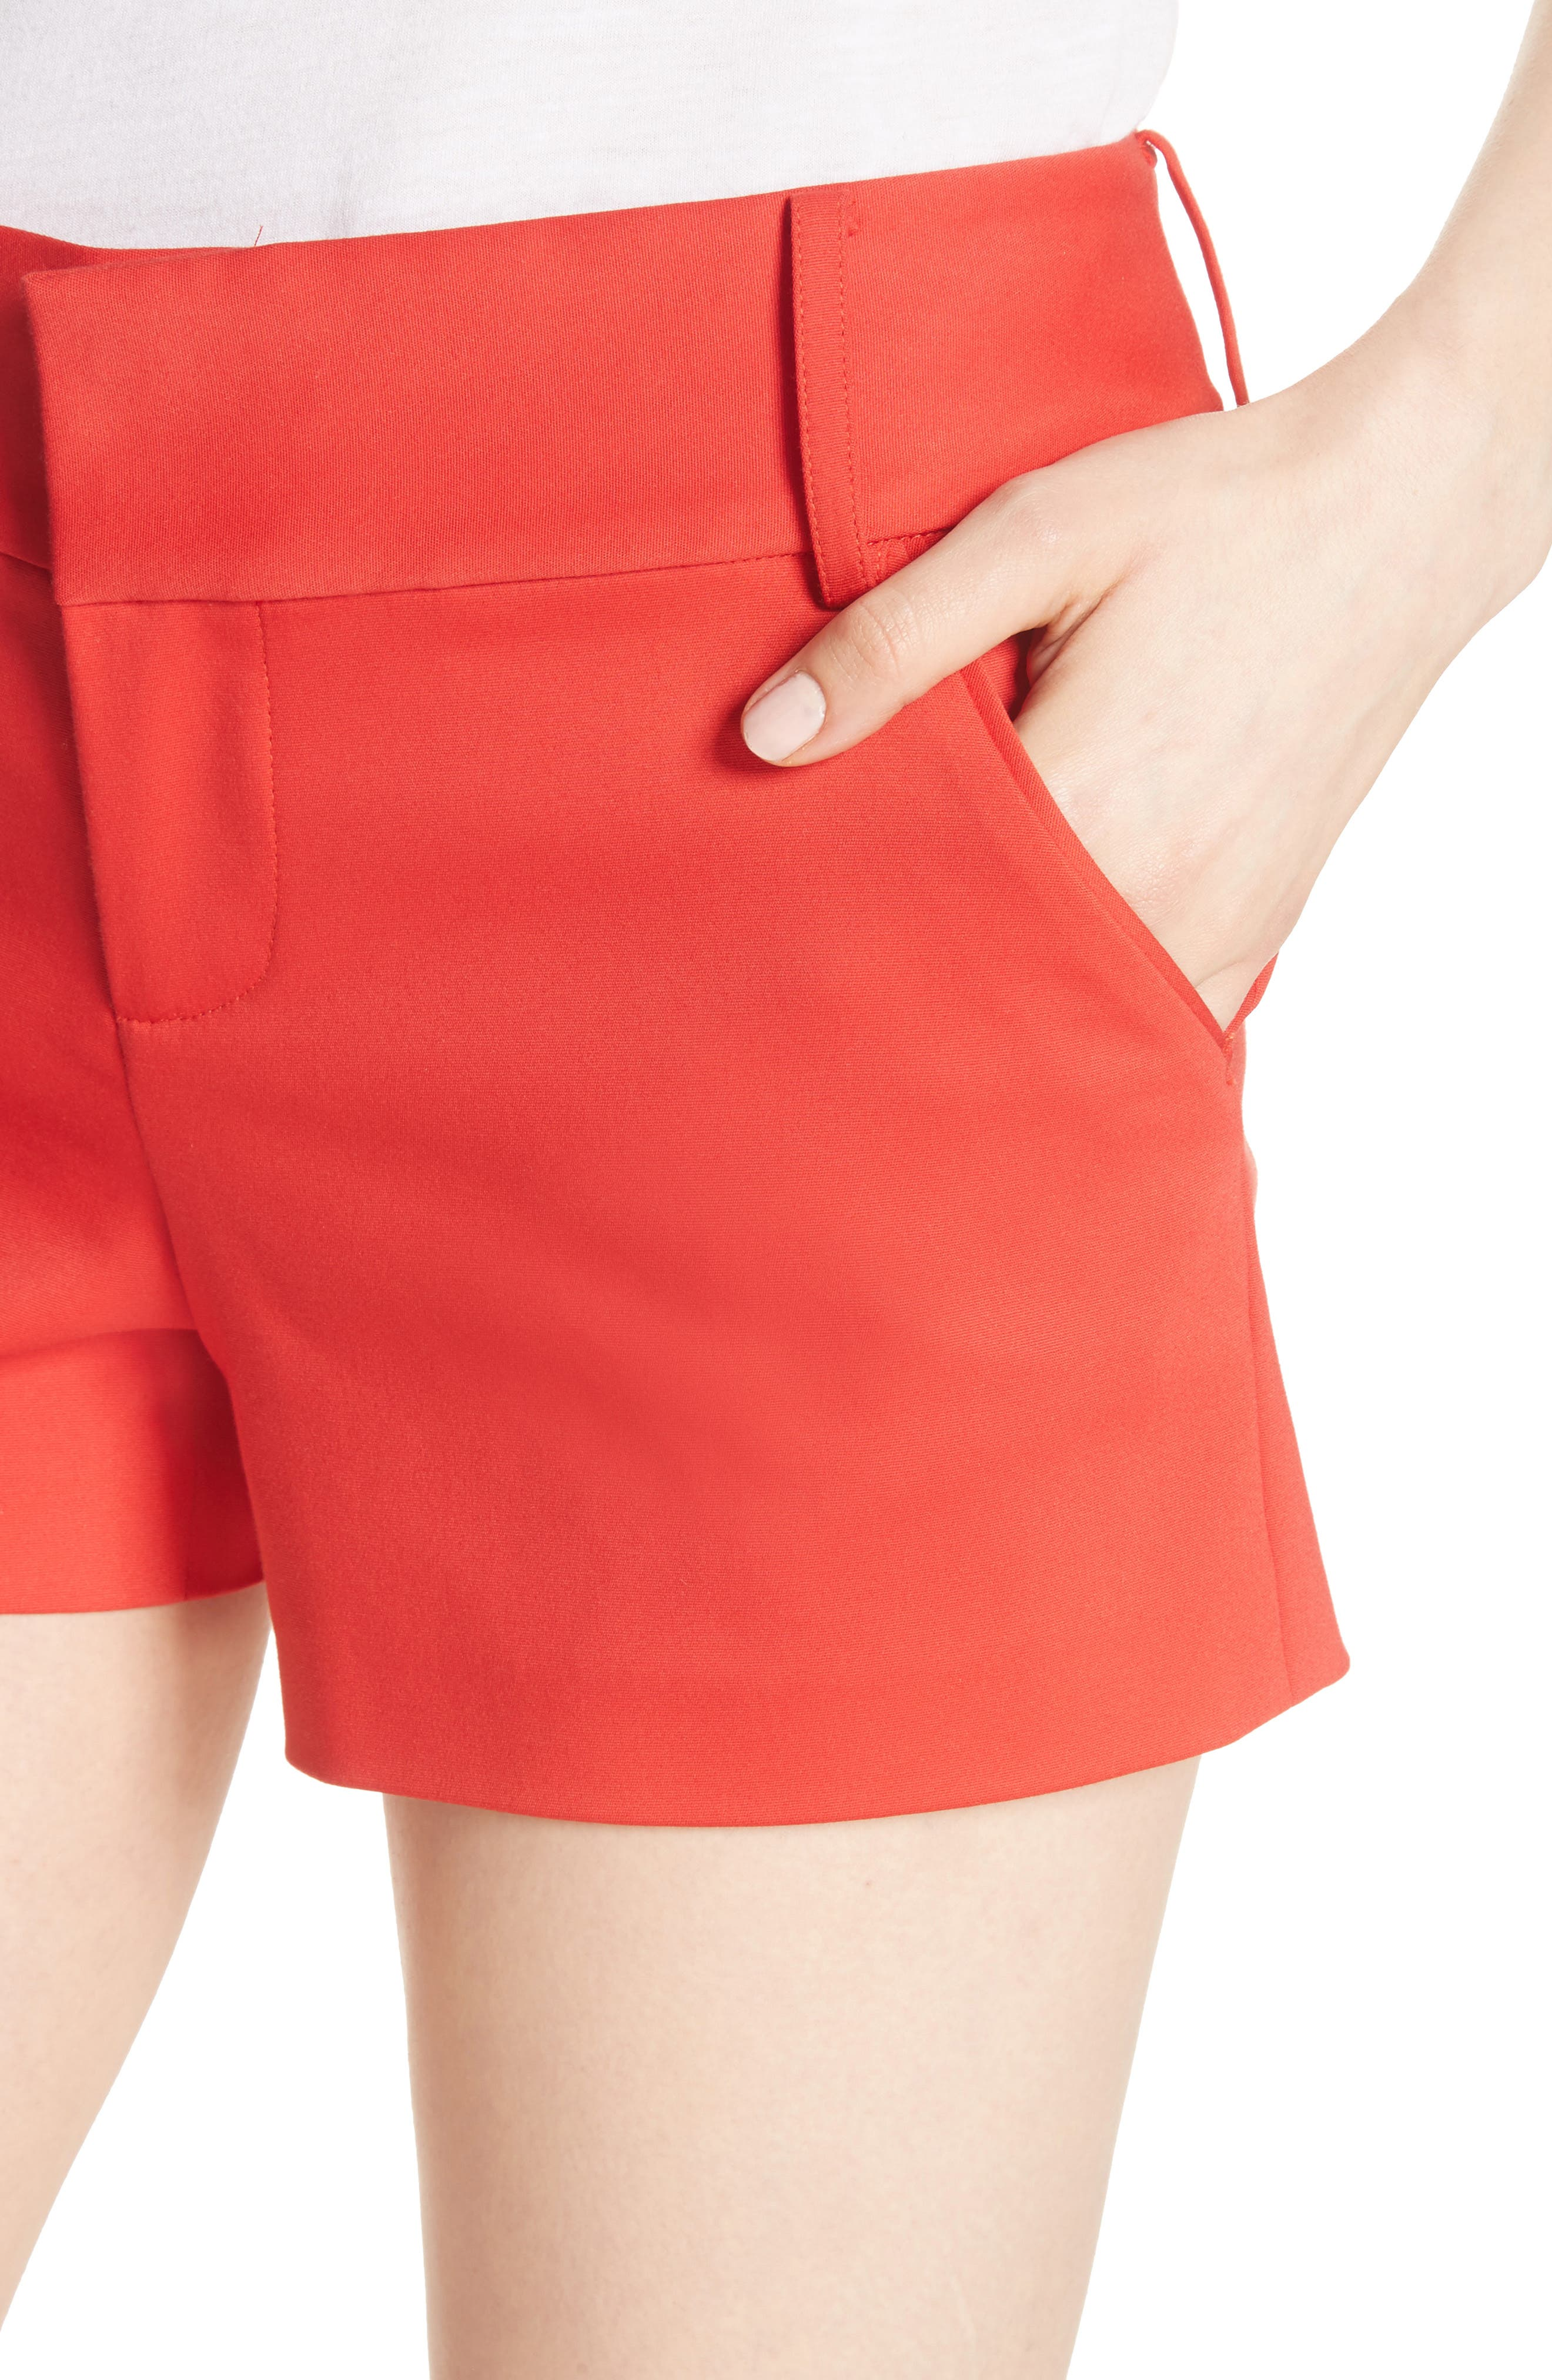 Cady Shorts,                             Alternate thumbnail 4, color,                             618